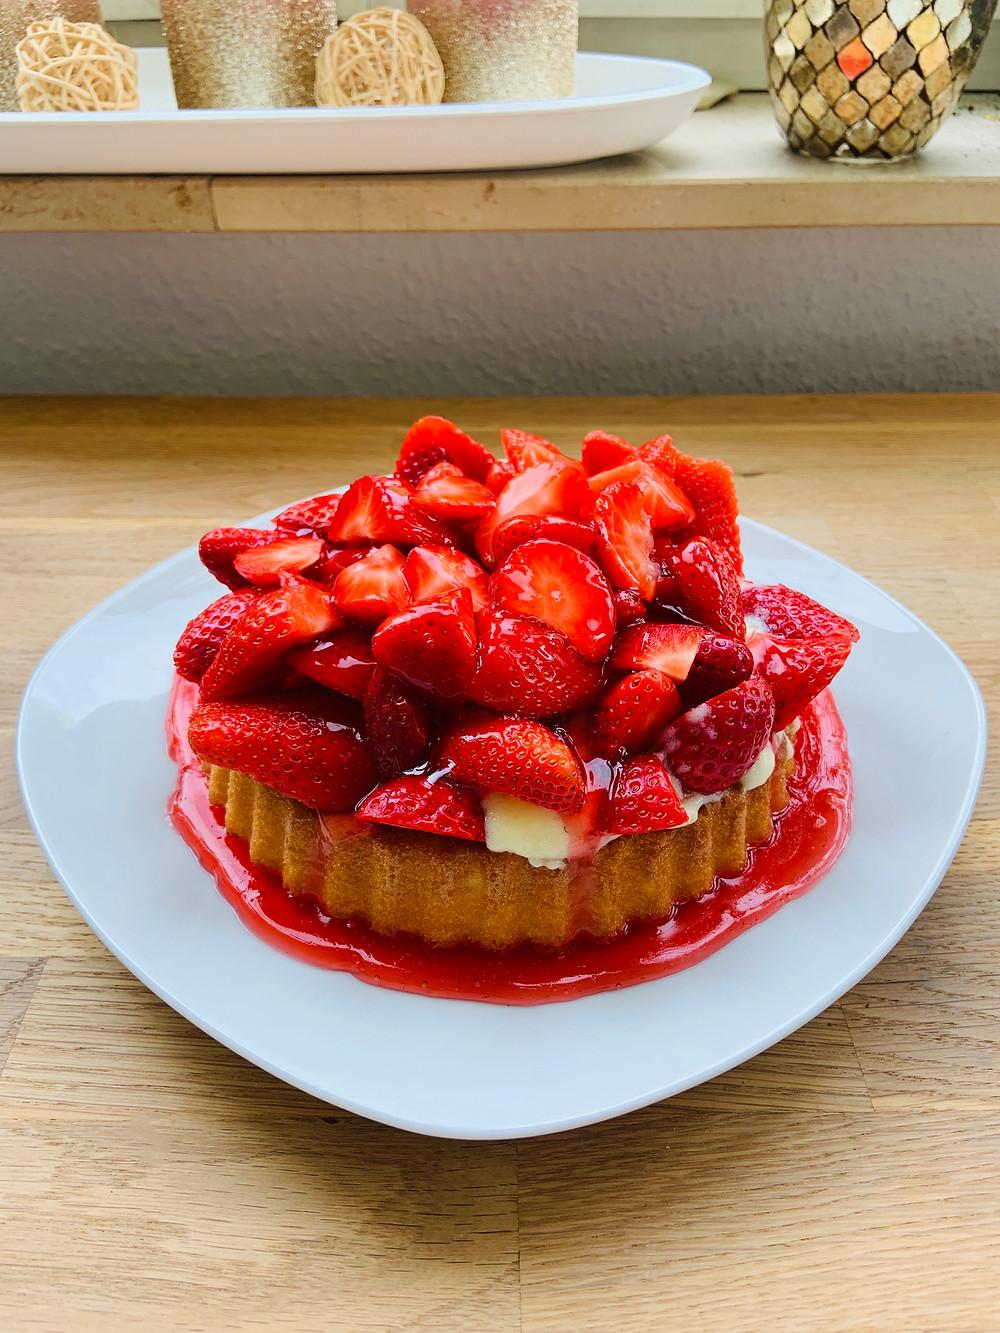 Vegan strawberry cake with whipped cream